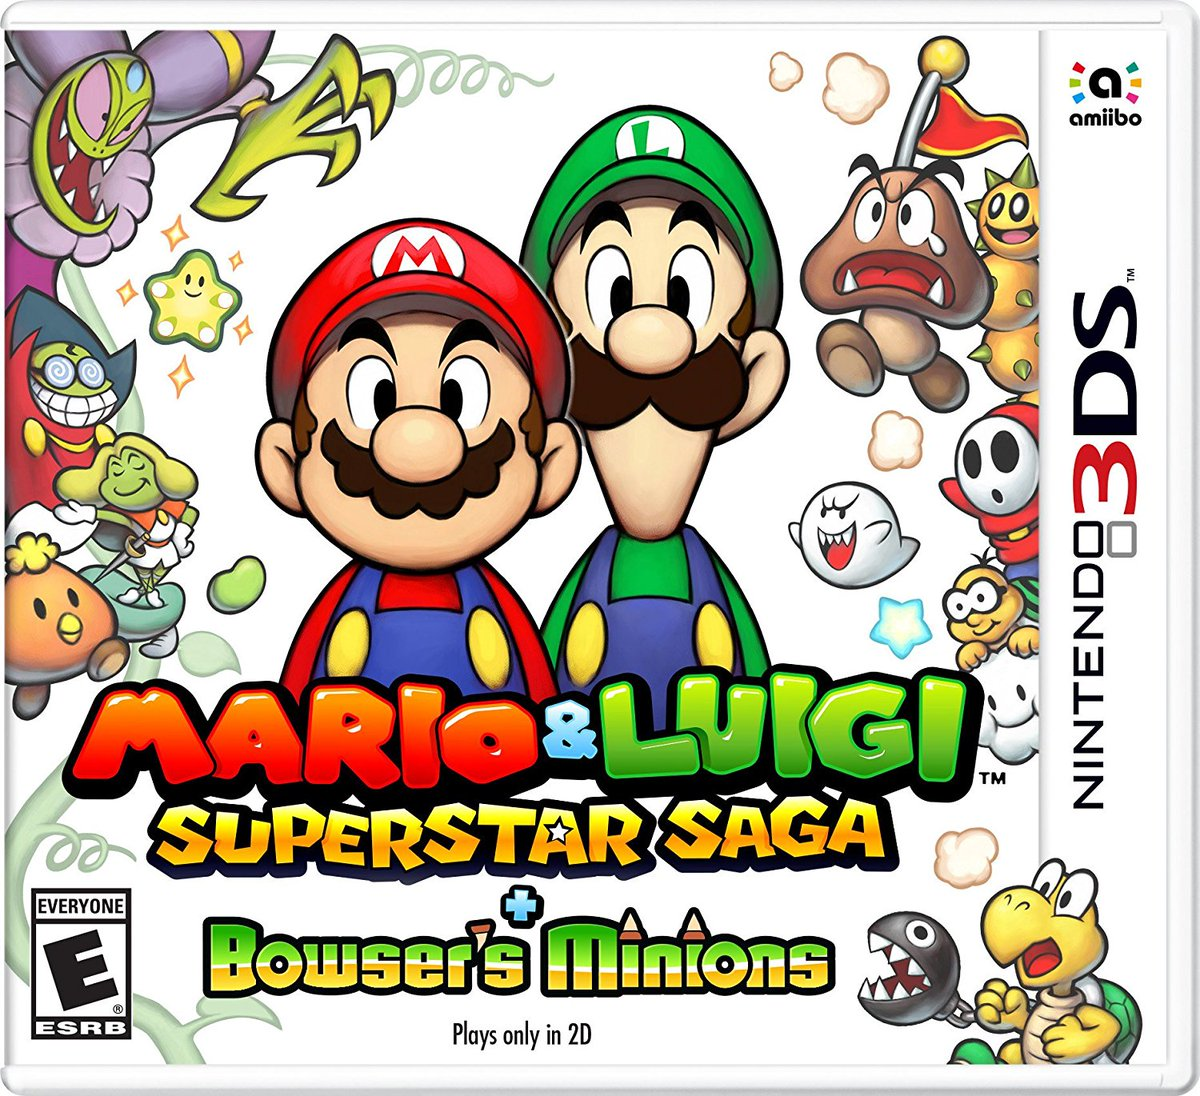 mario-luigi-superstar-saga-bowsers-minions-3ds-oficial-frikigamers.com